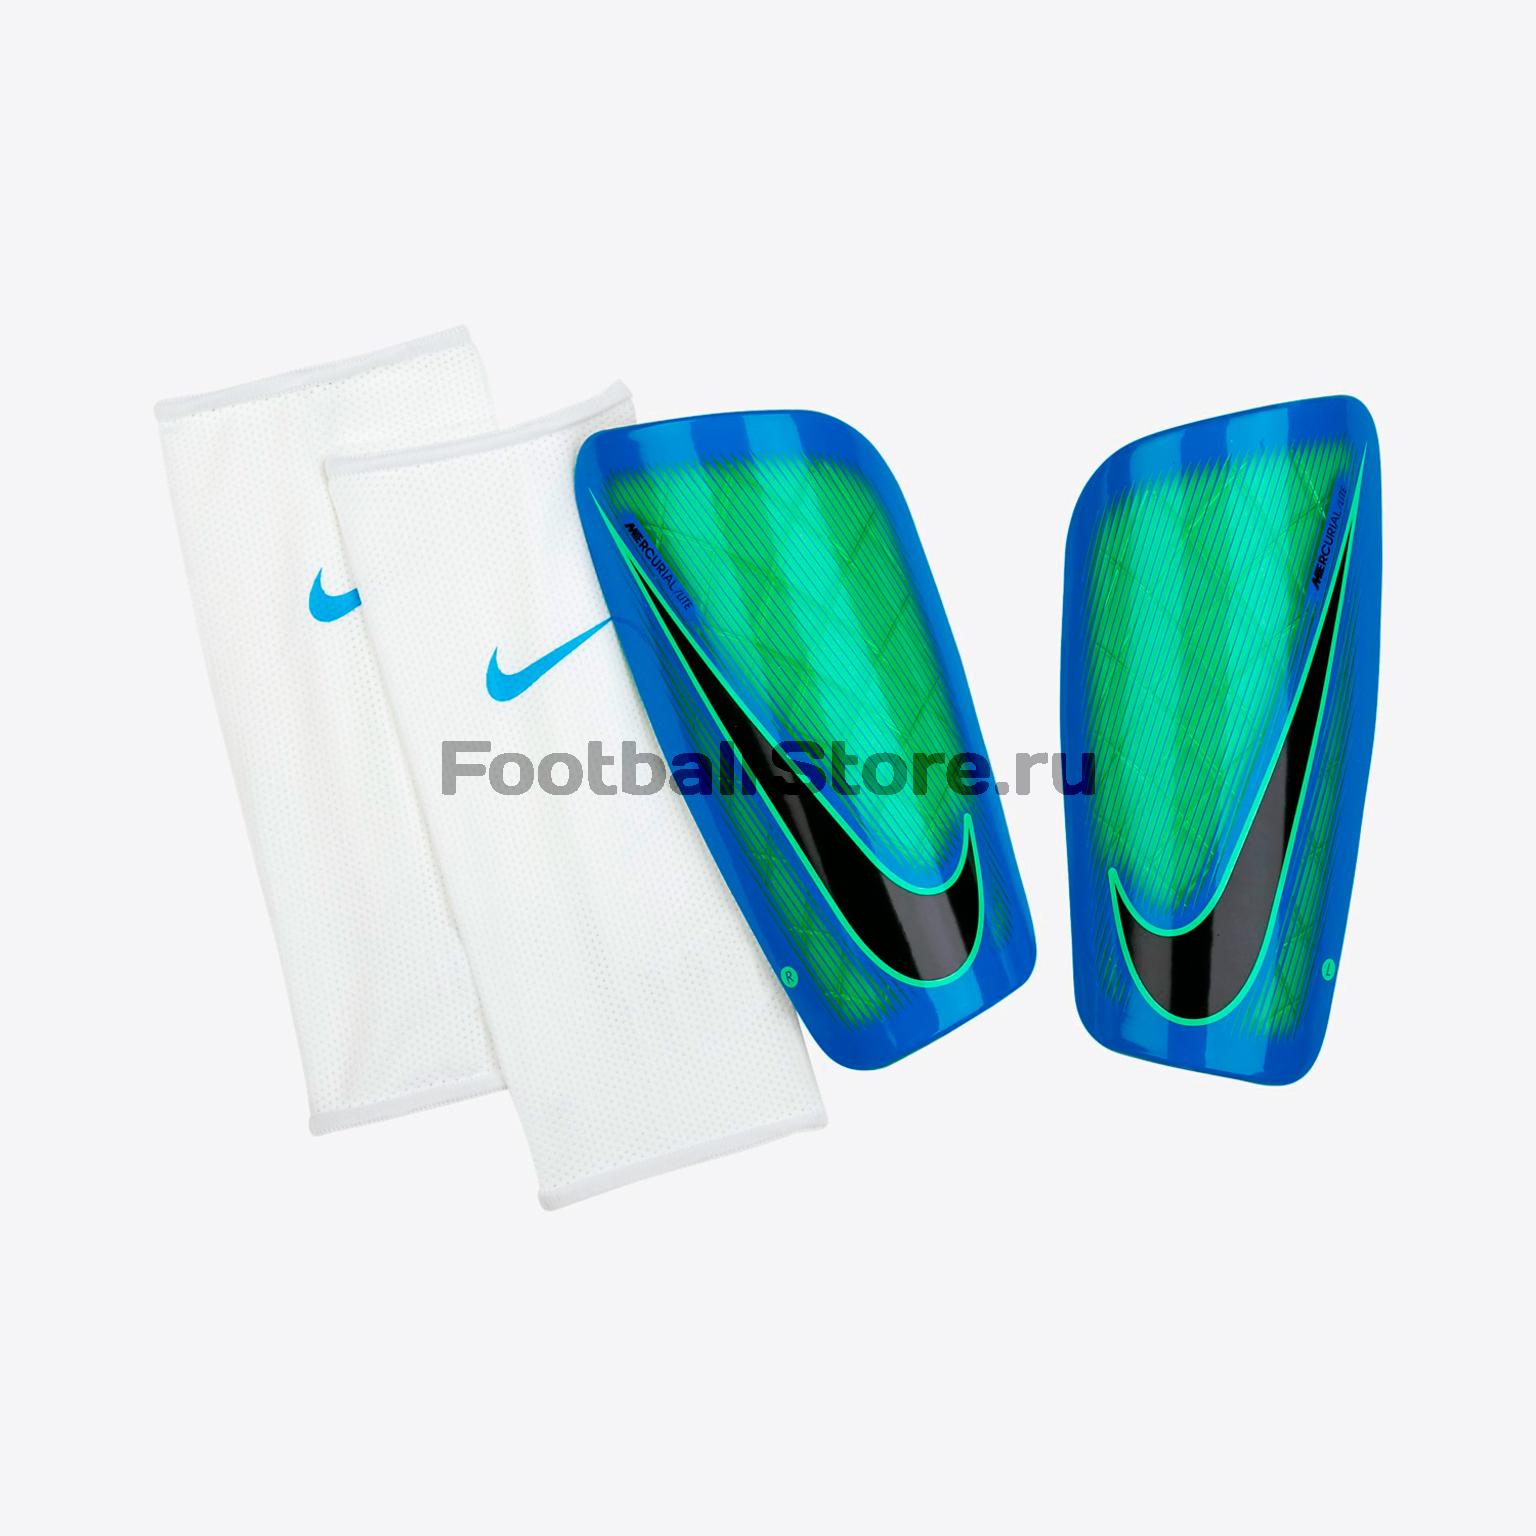 Защита ног Nike Щитки Nike NK Mercurial LT GRD SP2086-300 защита nike защита nk hyprstrng mtch ankl slv